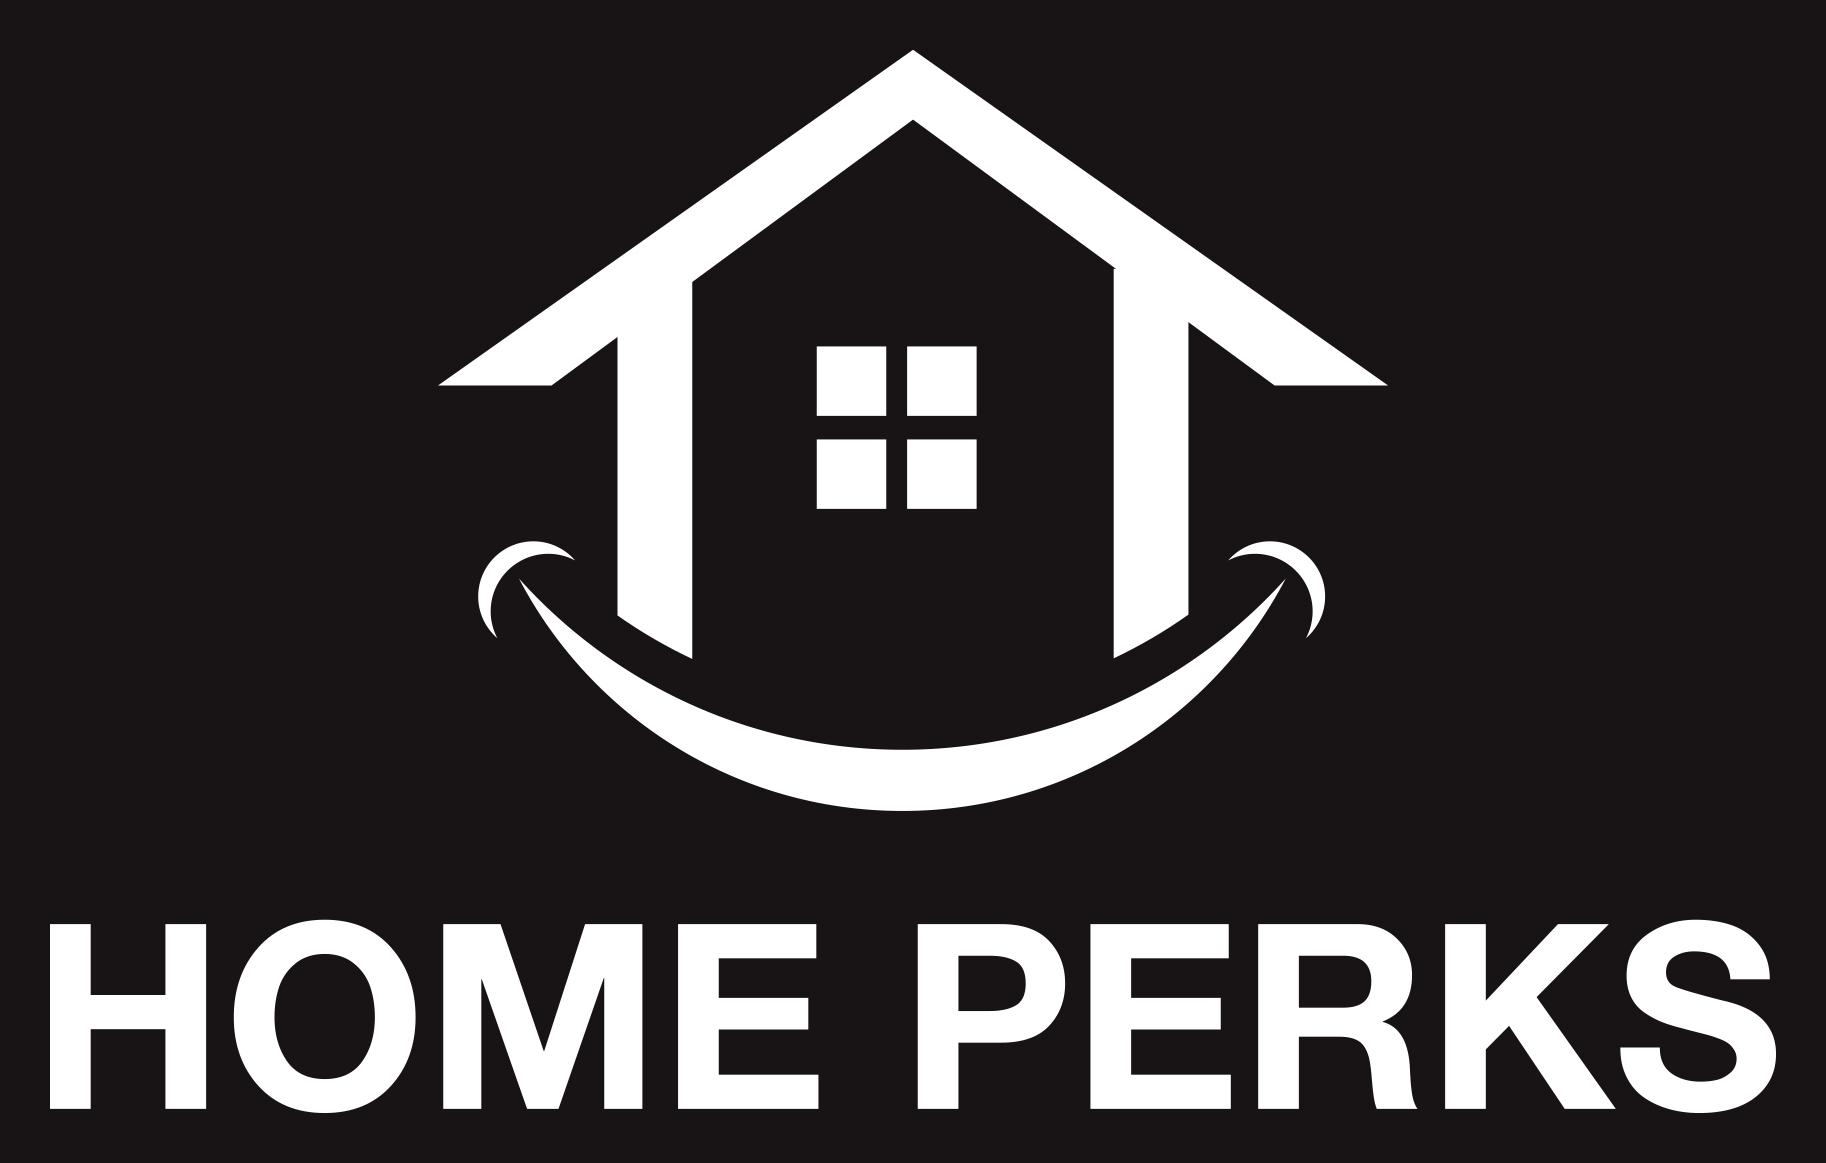 Home Perks logo